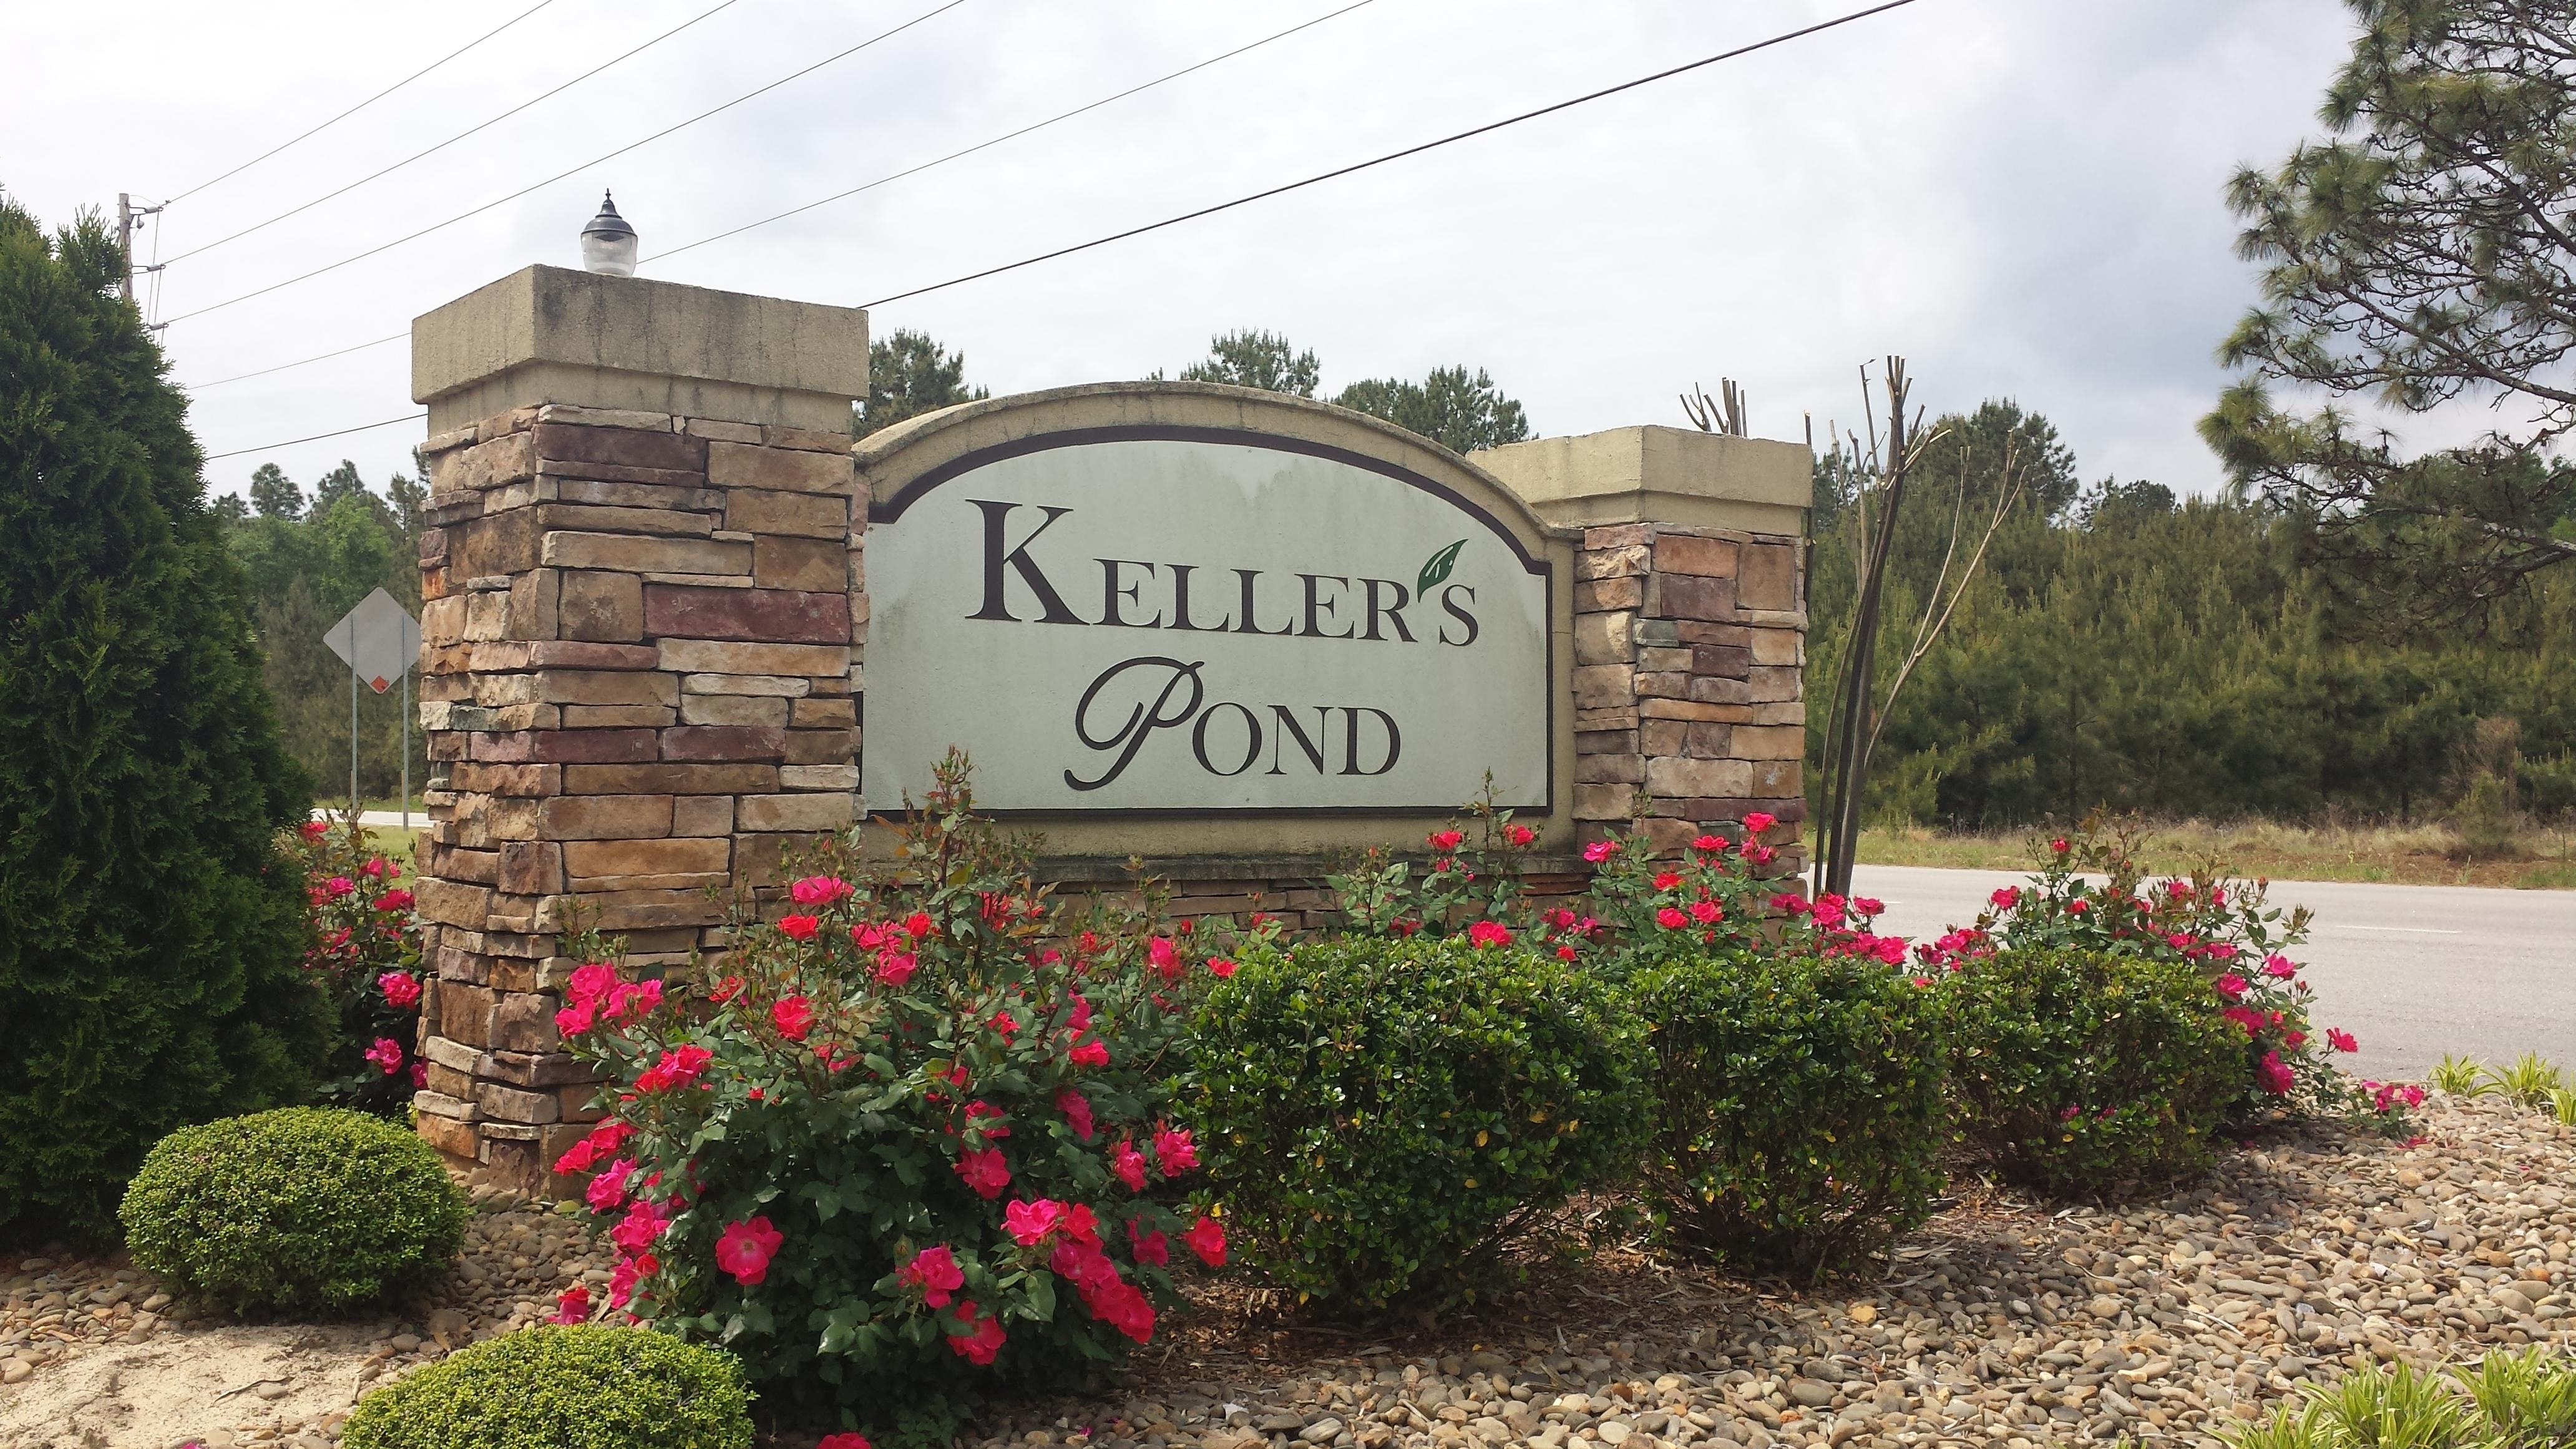 Keller's Pond